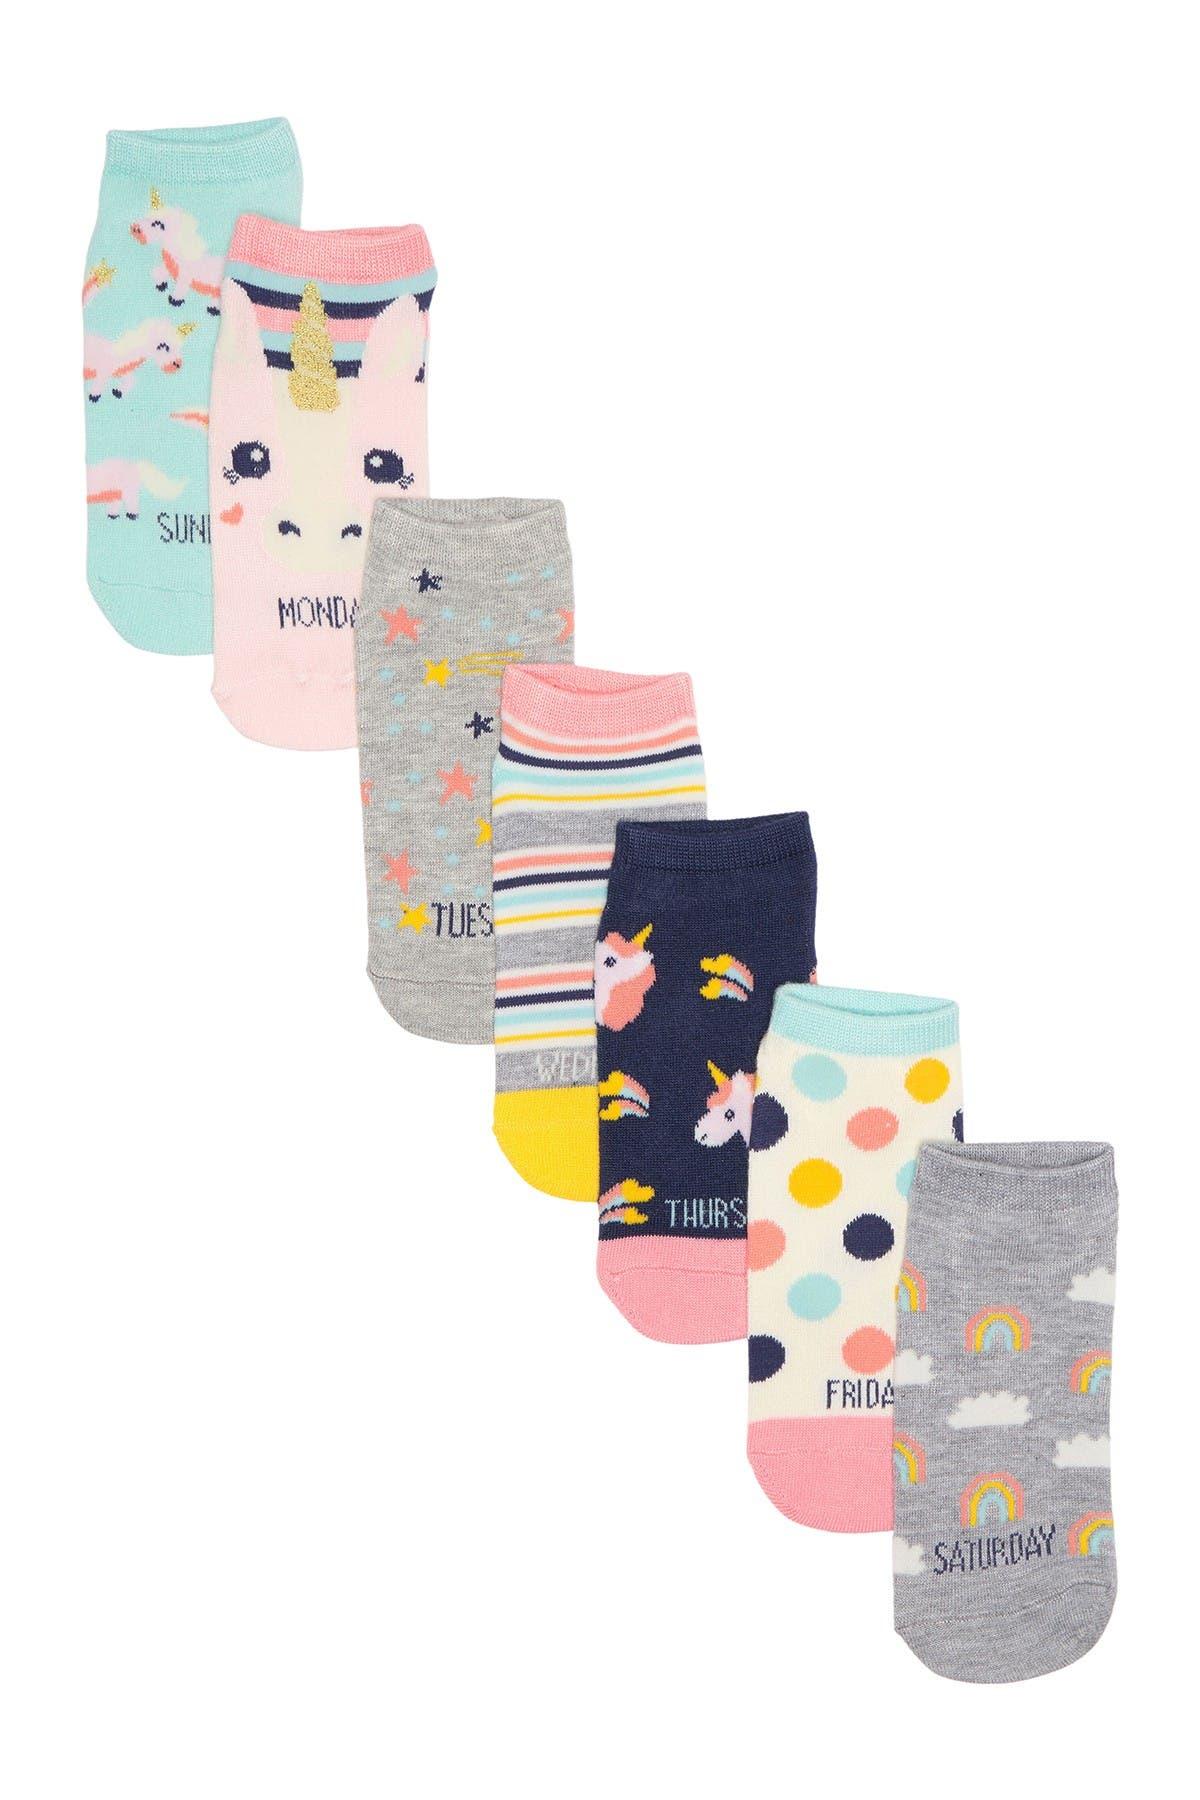 Image of Harper Canyon Unicorn Days Low Cut Socks - Pack of 7